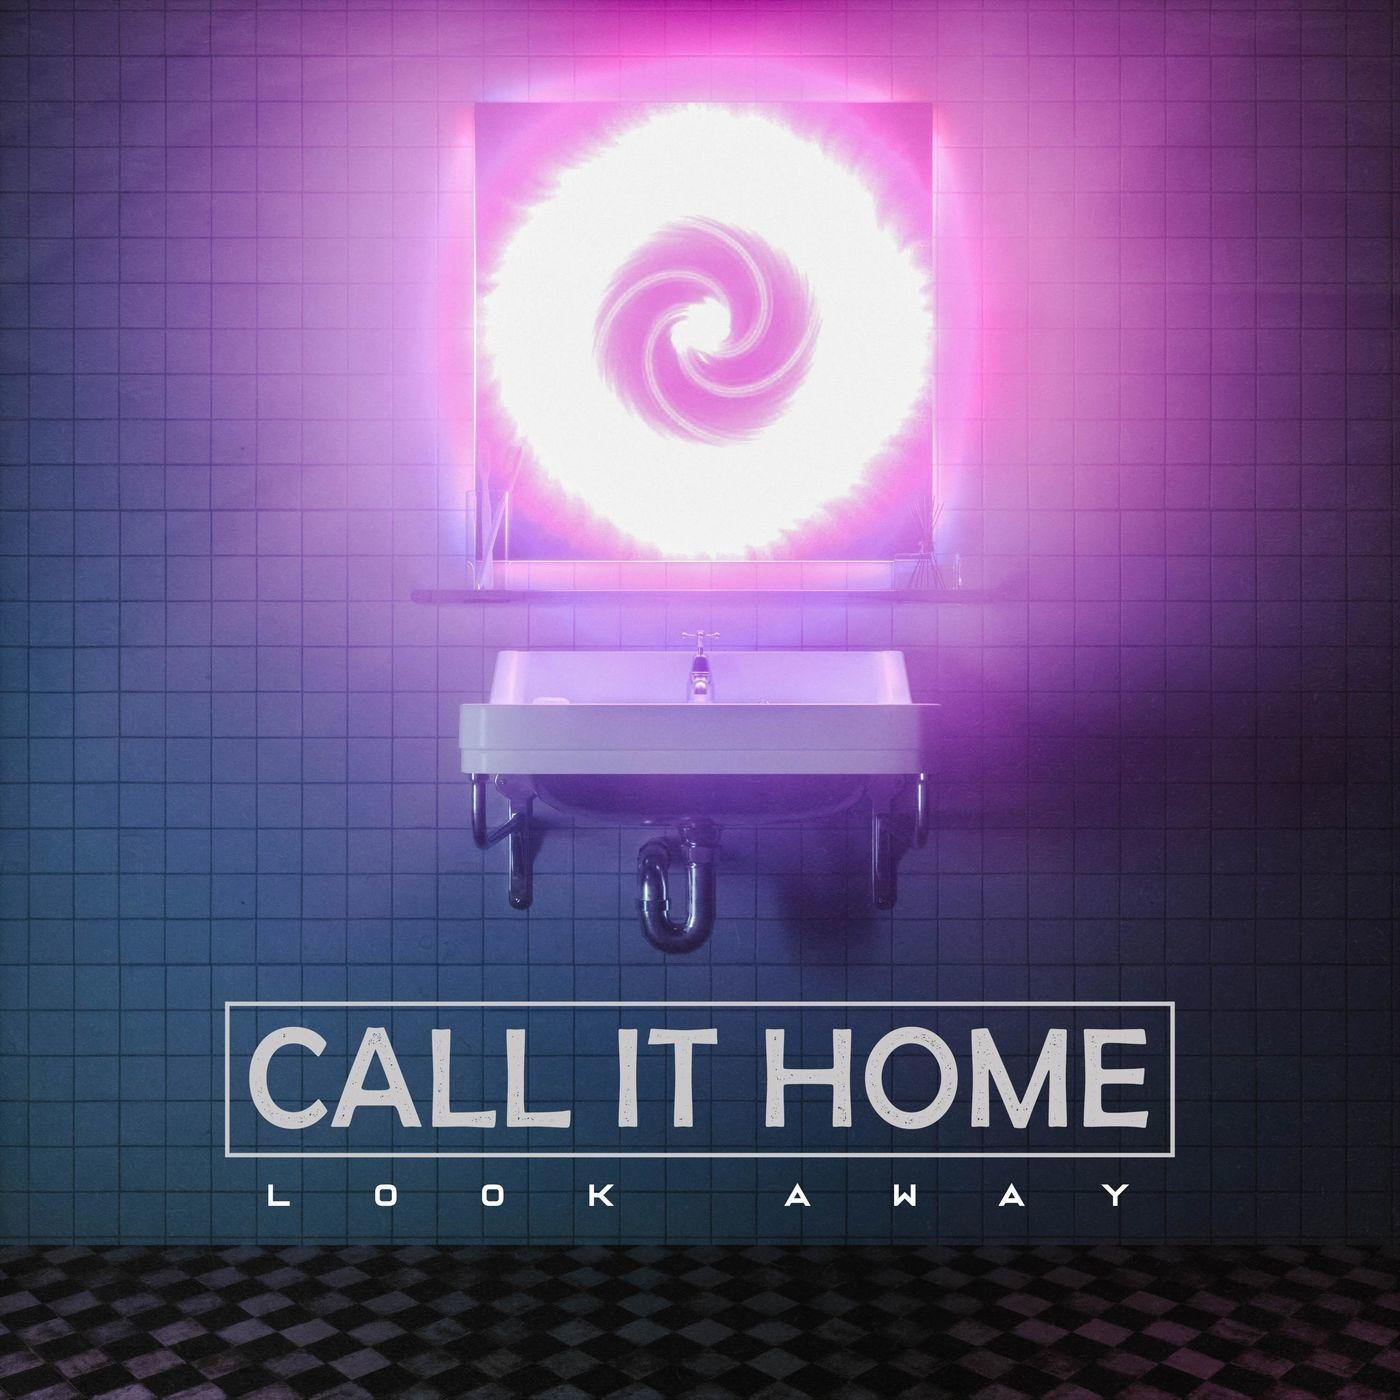 Call It Home - Look Away [Single] (2019)